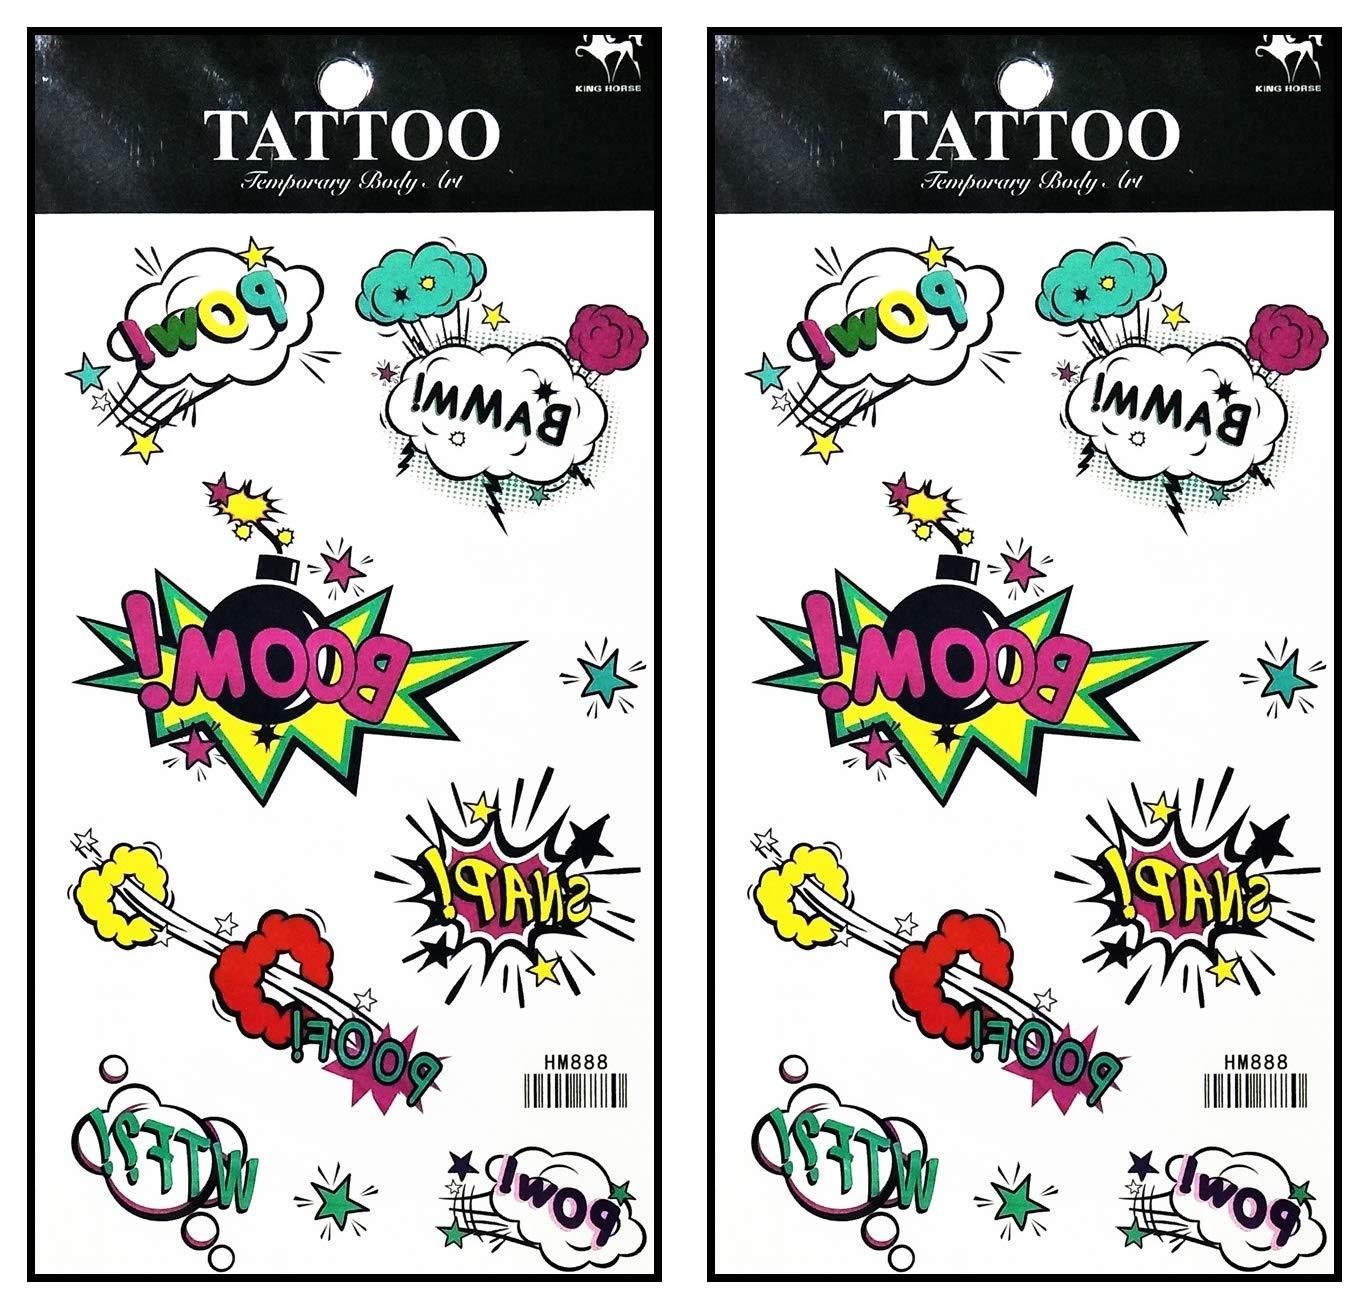 Tattoos 2 Sheets Boom! Pow! BAMM! Wow! Fun Funny Superhero Comics Waterproof Temporary Tattoo Sticker Fashion Flash Tatoo Fake Tattoo Removable for Men Women